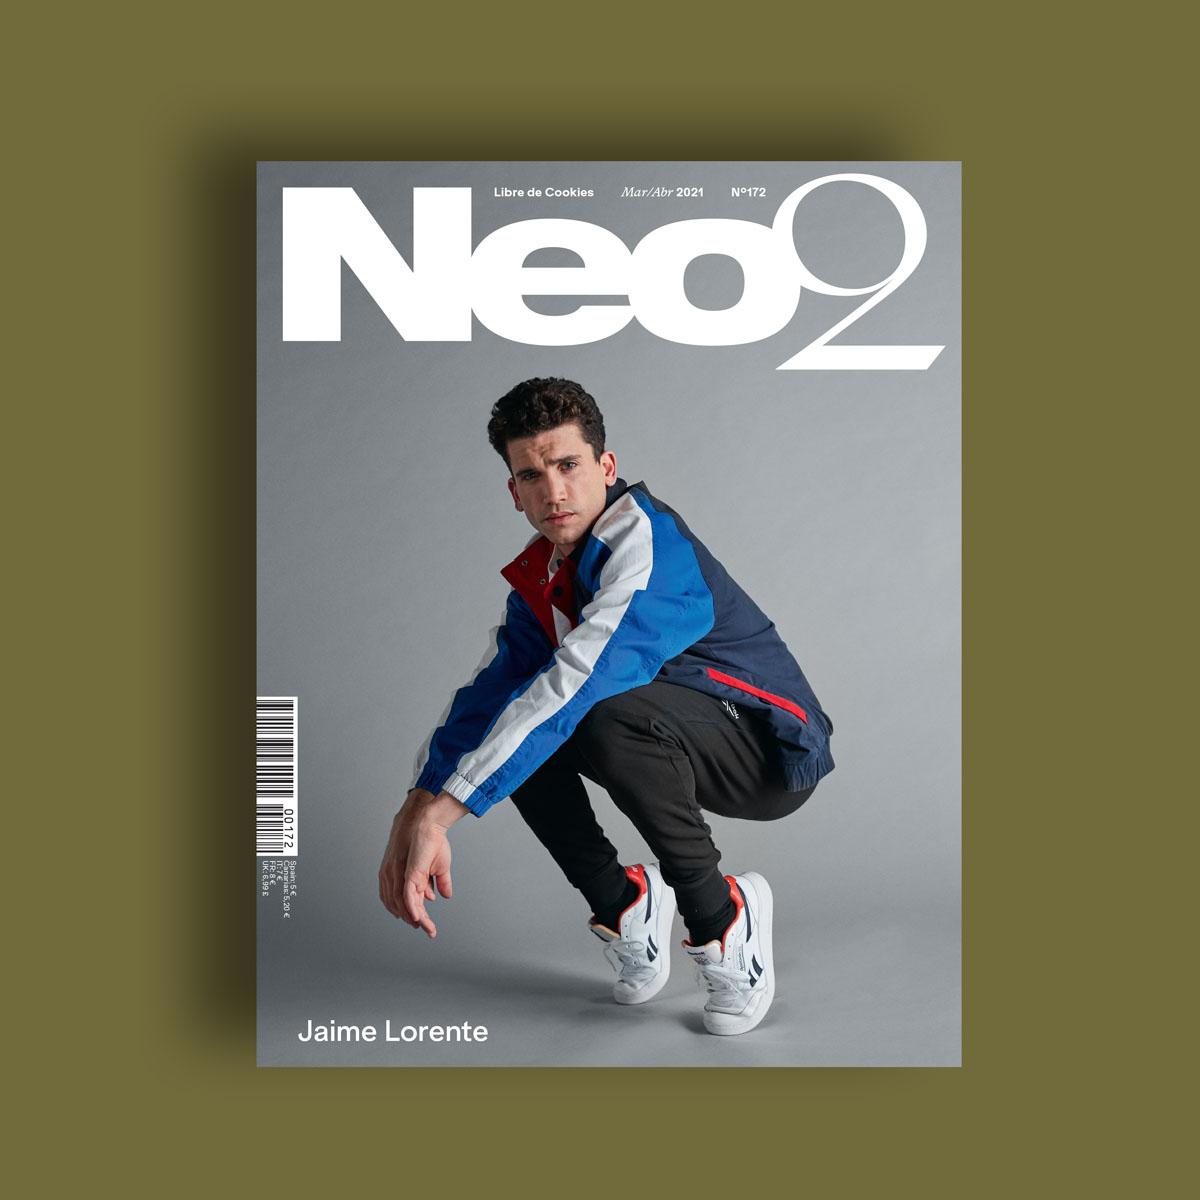 Neo2 Magazine portada de Jaime Lorente